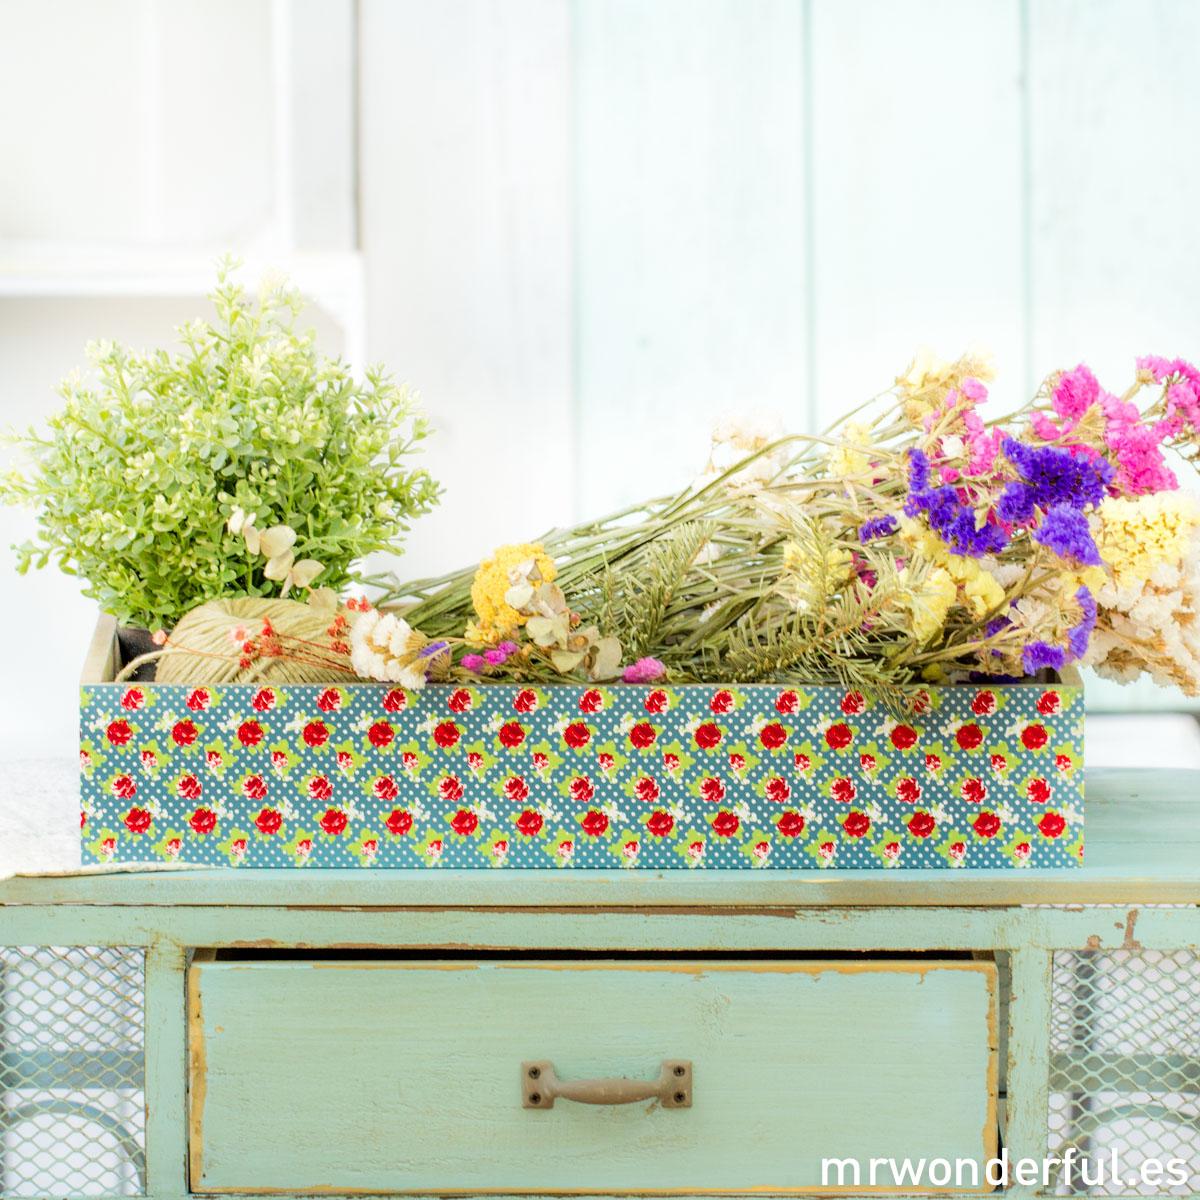 mrwonderful_62908-A_bandeja-madera-estampado-floral-73